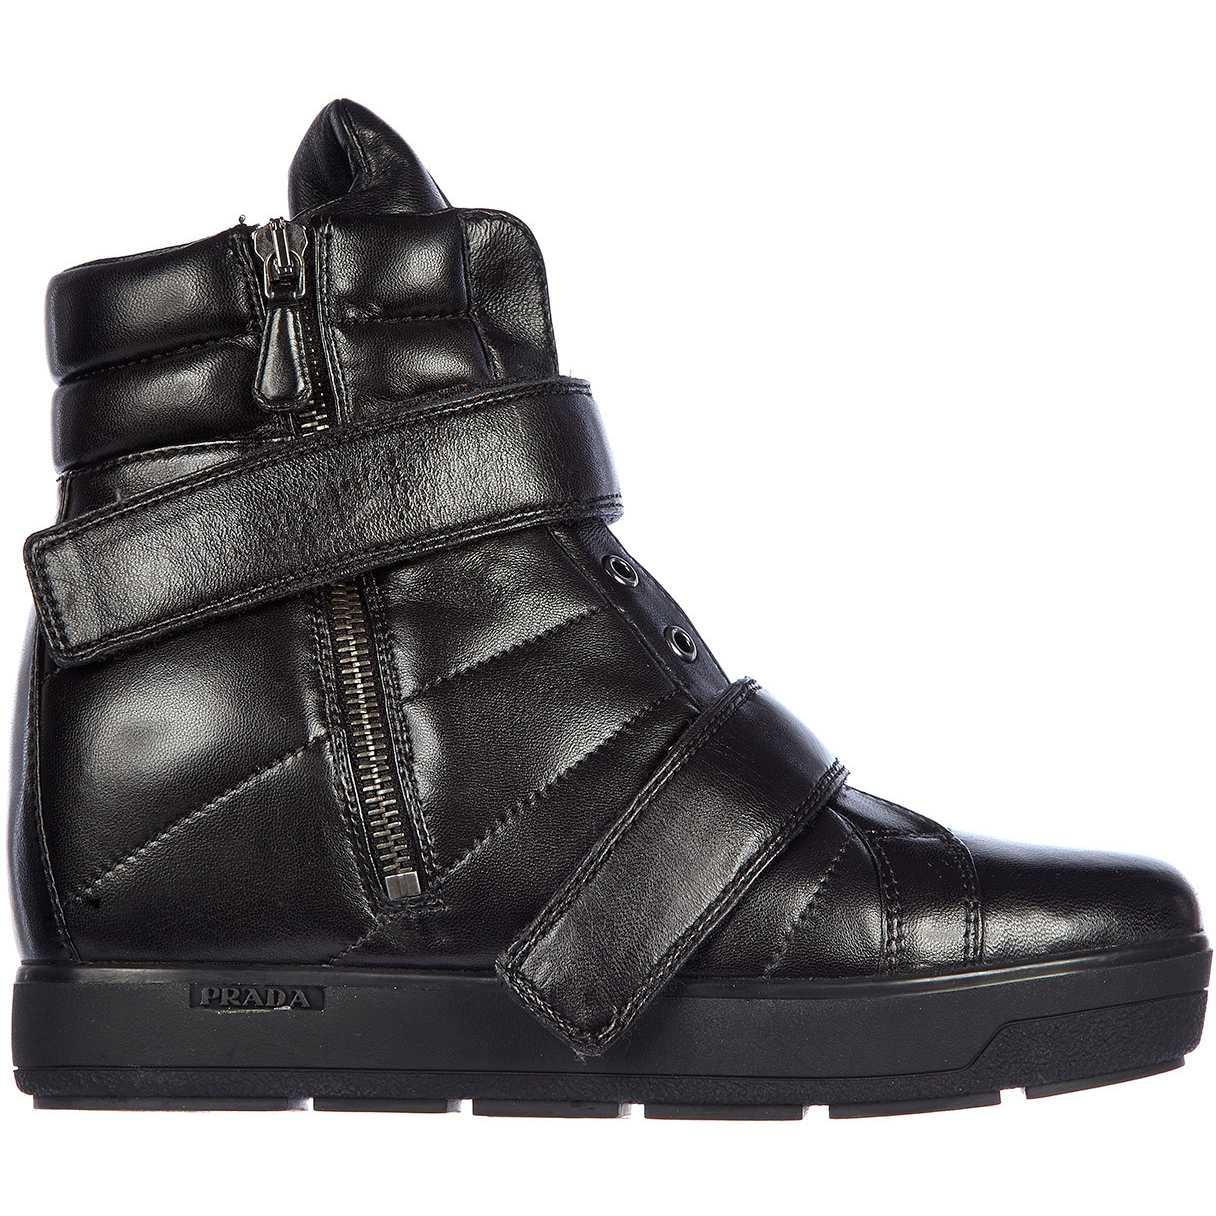 Prada High Top Sneakers Nappa Sport Black pentru femei